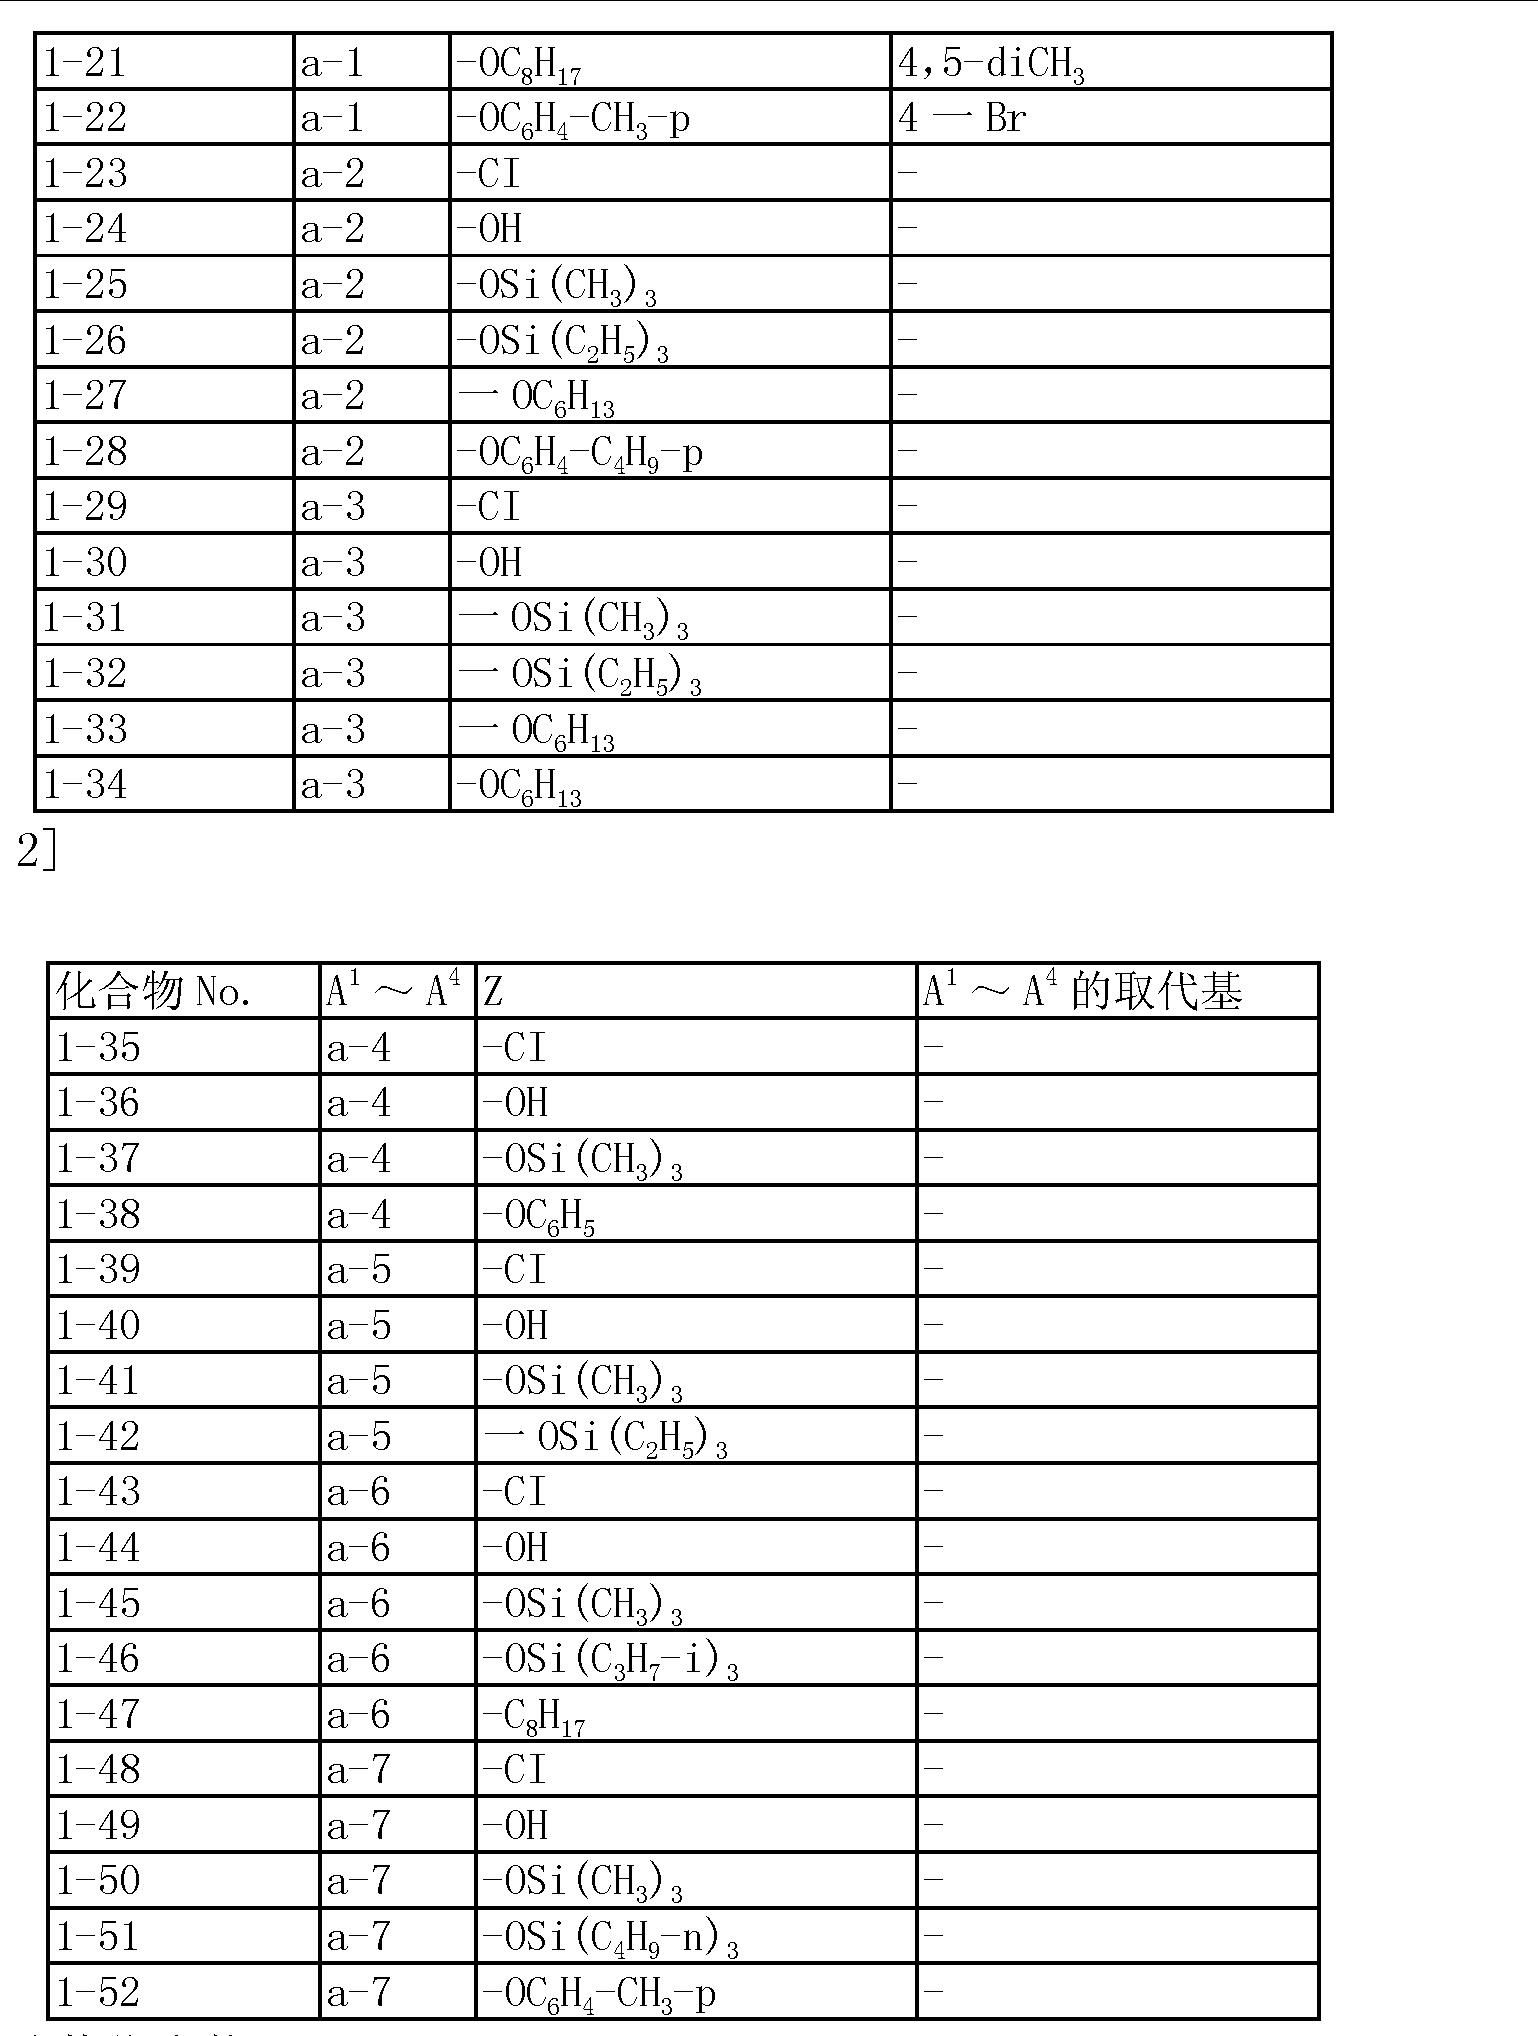 Cn103365133a Production Process For Colorant Composition Hikaru Anti Glare Xiaomi Redmi Note 4 4x Clear Figure Cn103365133ad00111